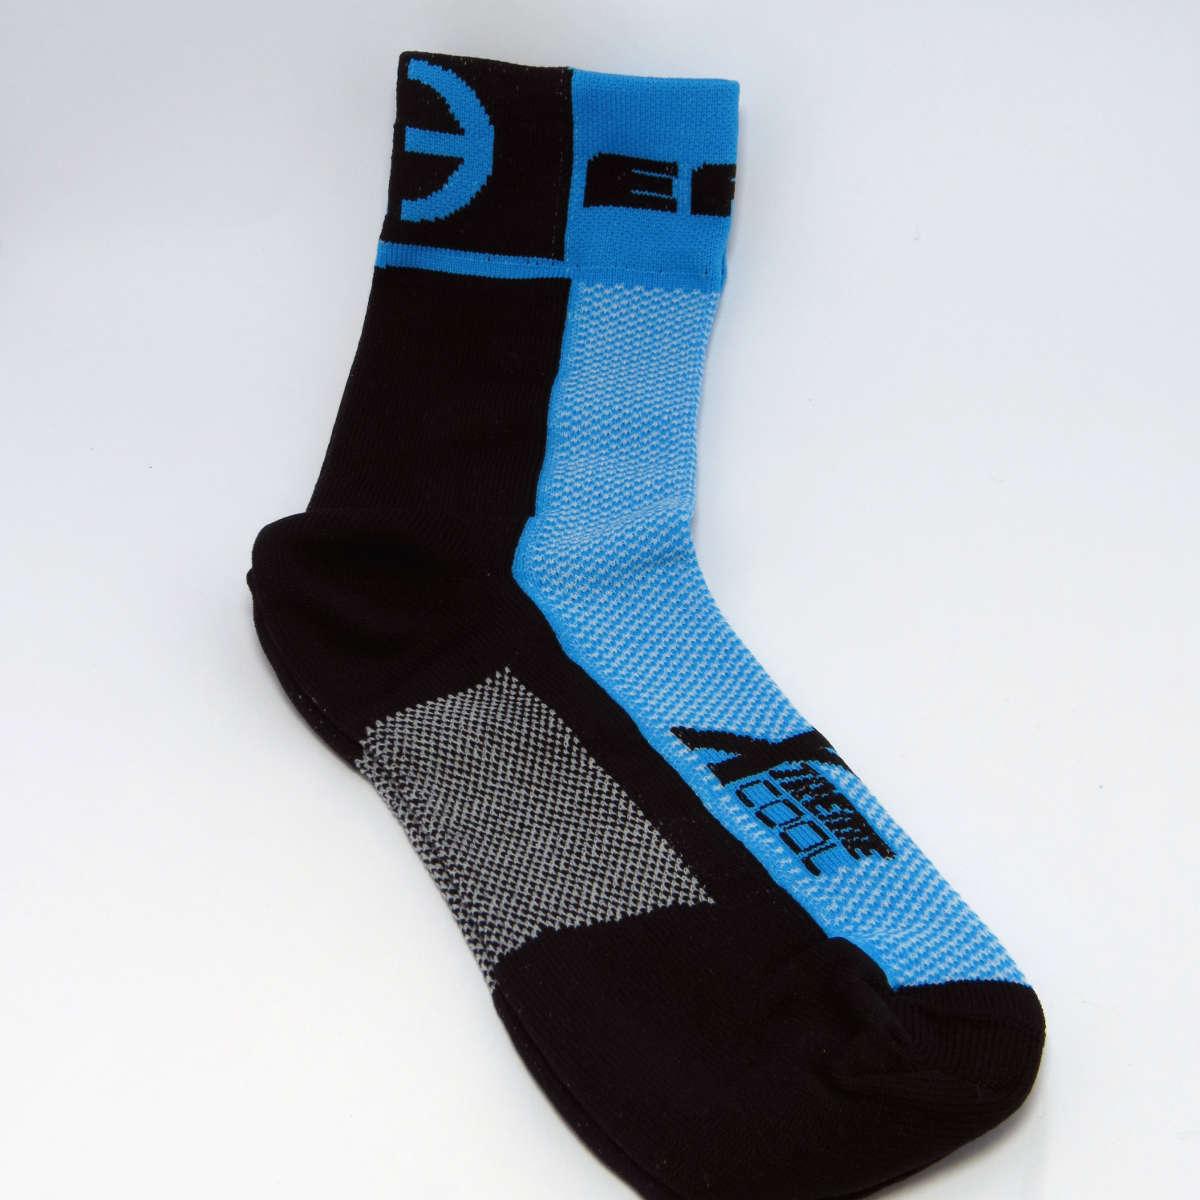 Meia Ert Xtreme Cool Preto/Azul